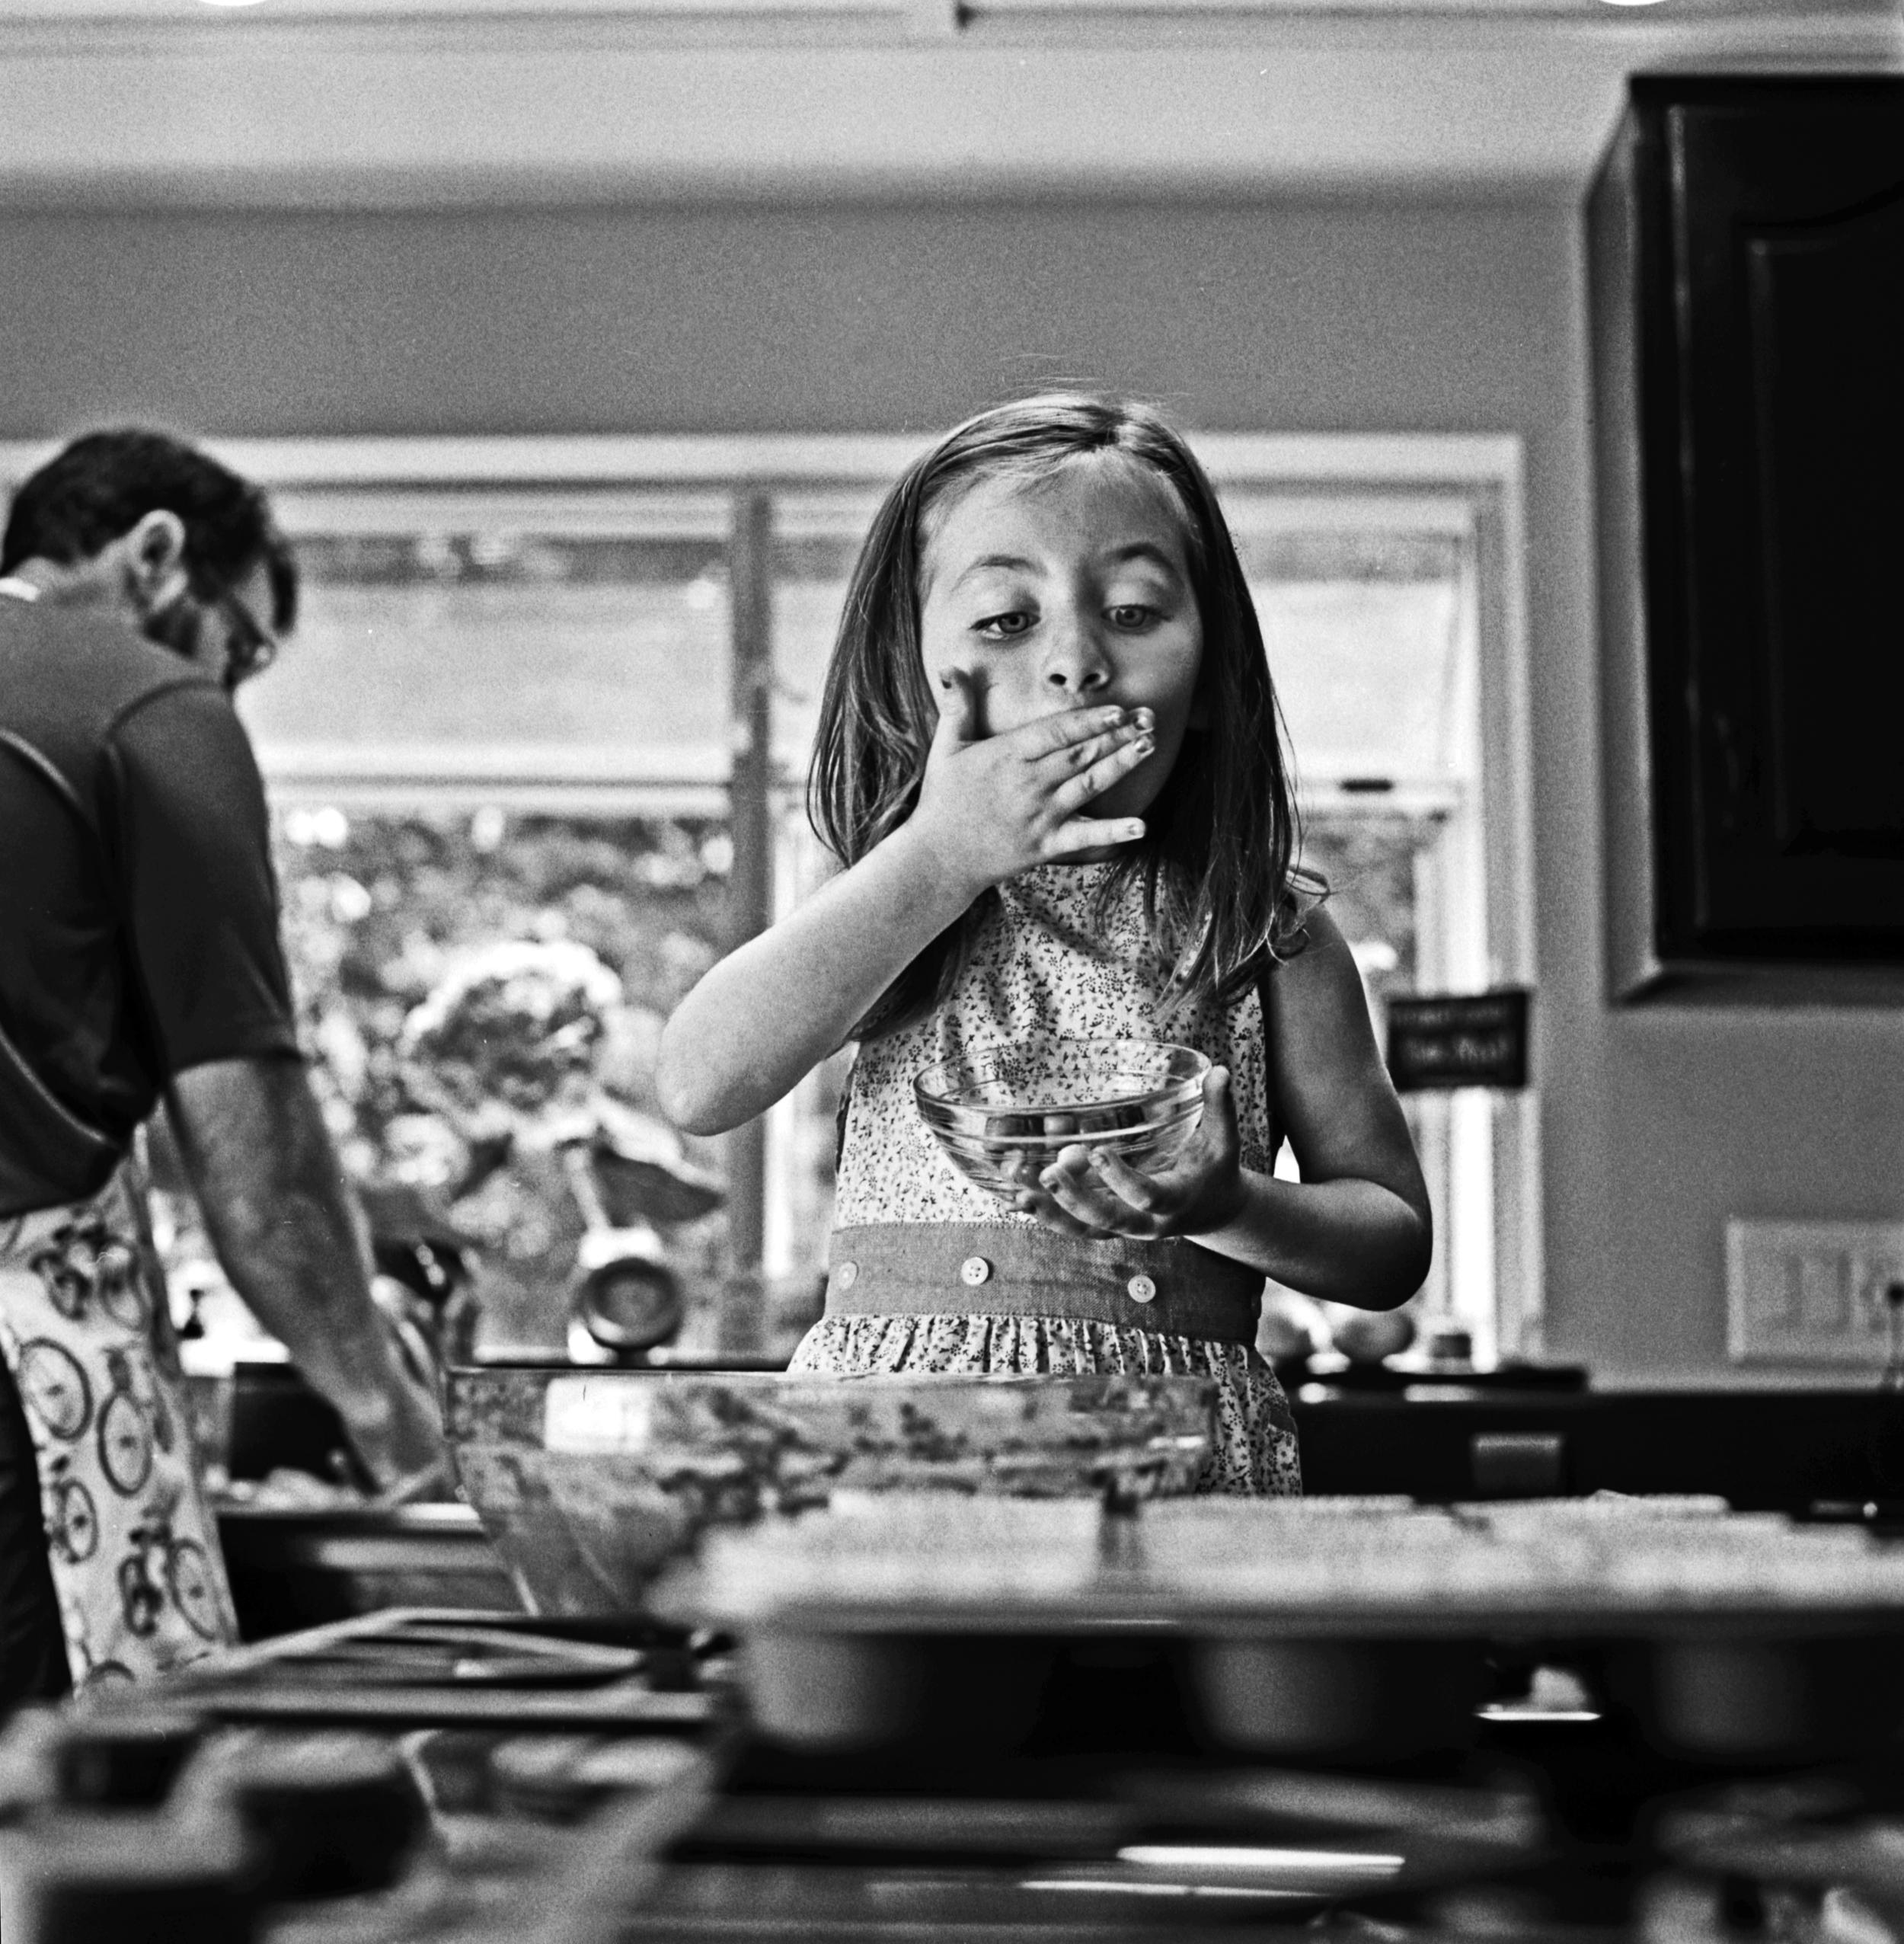 Ellen Goodman | Chocolate Chip Inspector - The Baking Series | Hasselblad 500CM